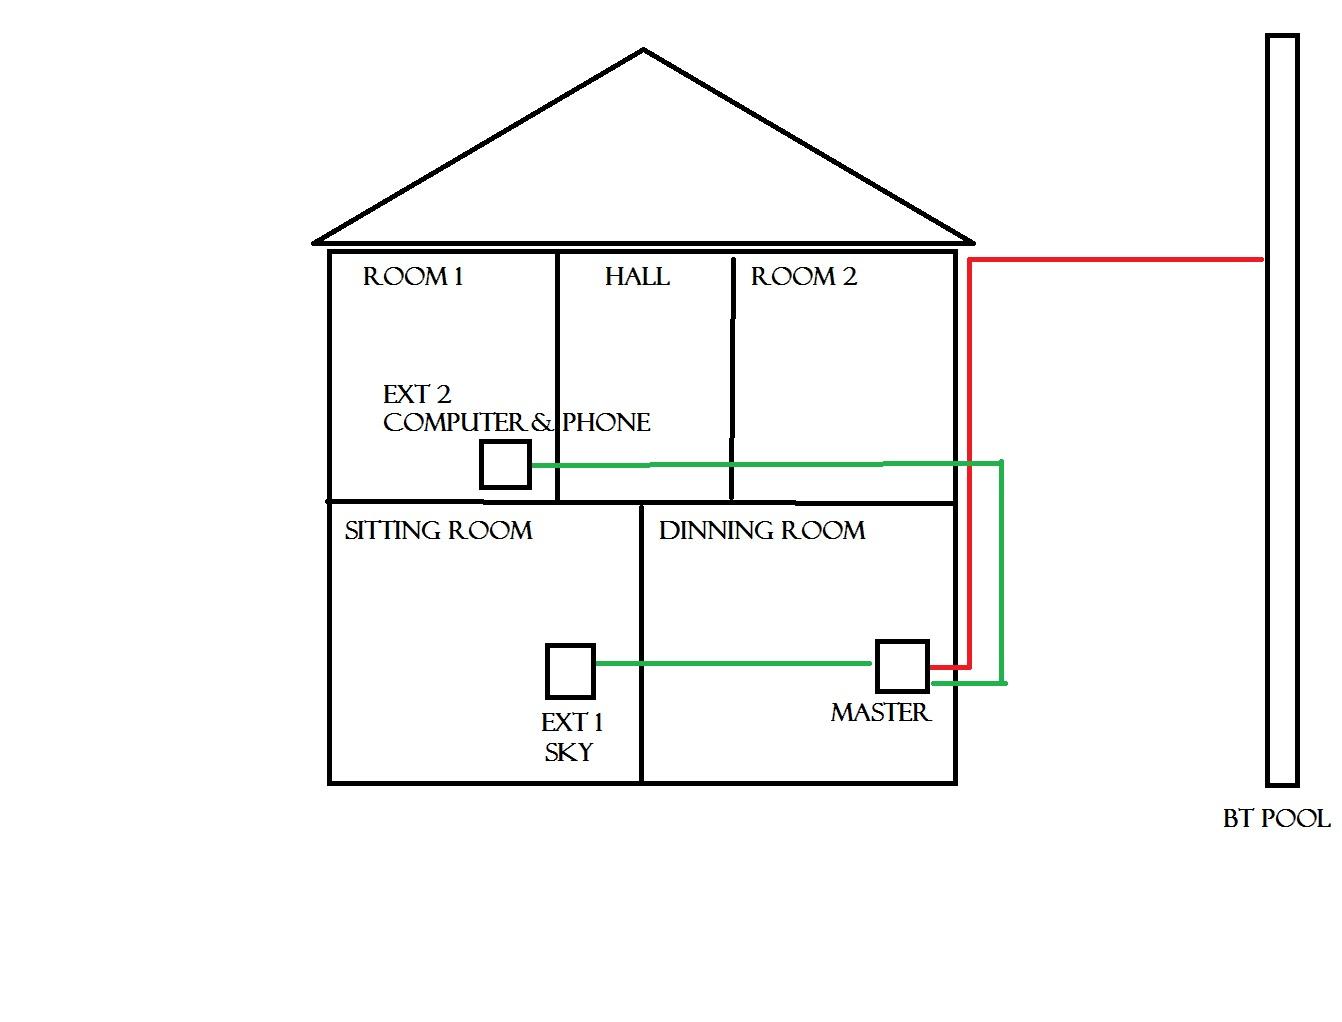 hight resolution of bt infinity 2 wiring diagram wiring librarybt infinity 2 wiring diagram